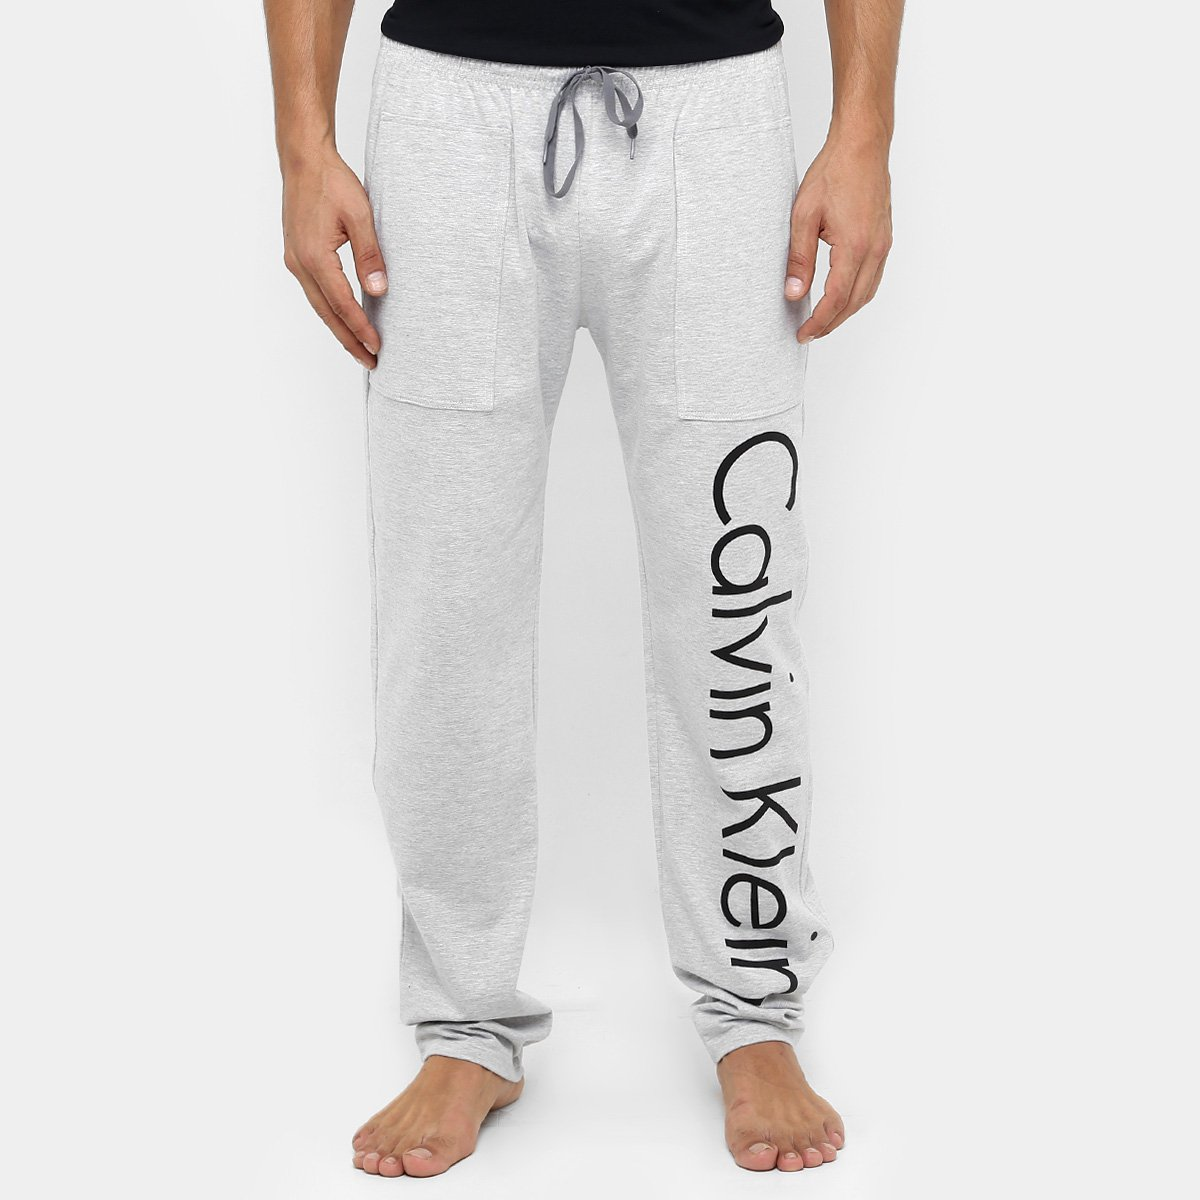 a9307bcba245d Calça De Pijama Calvin Klein Logo ID - Compre Agora   Zattini